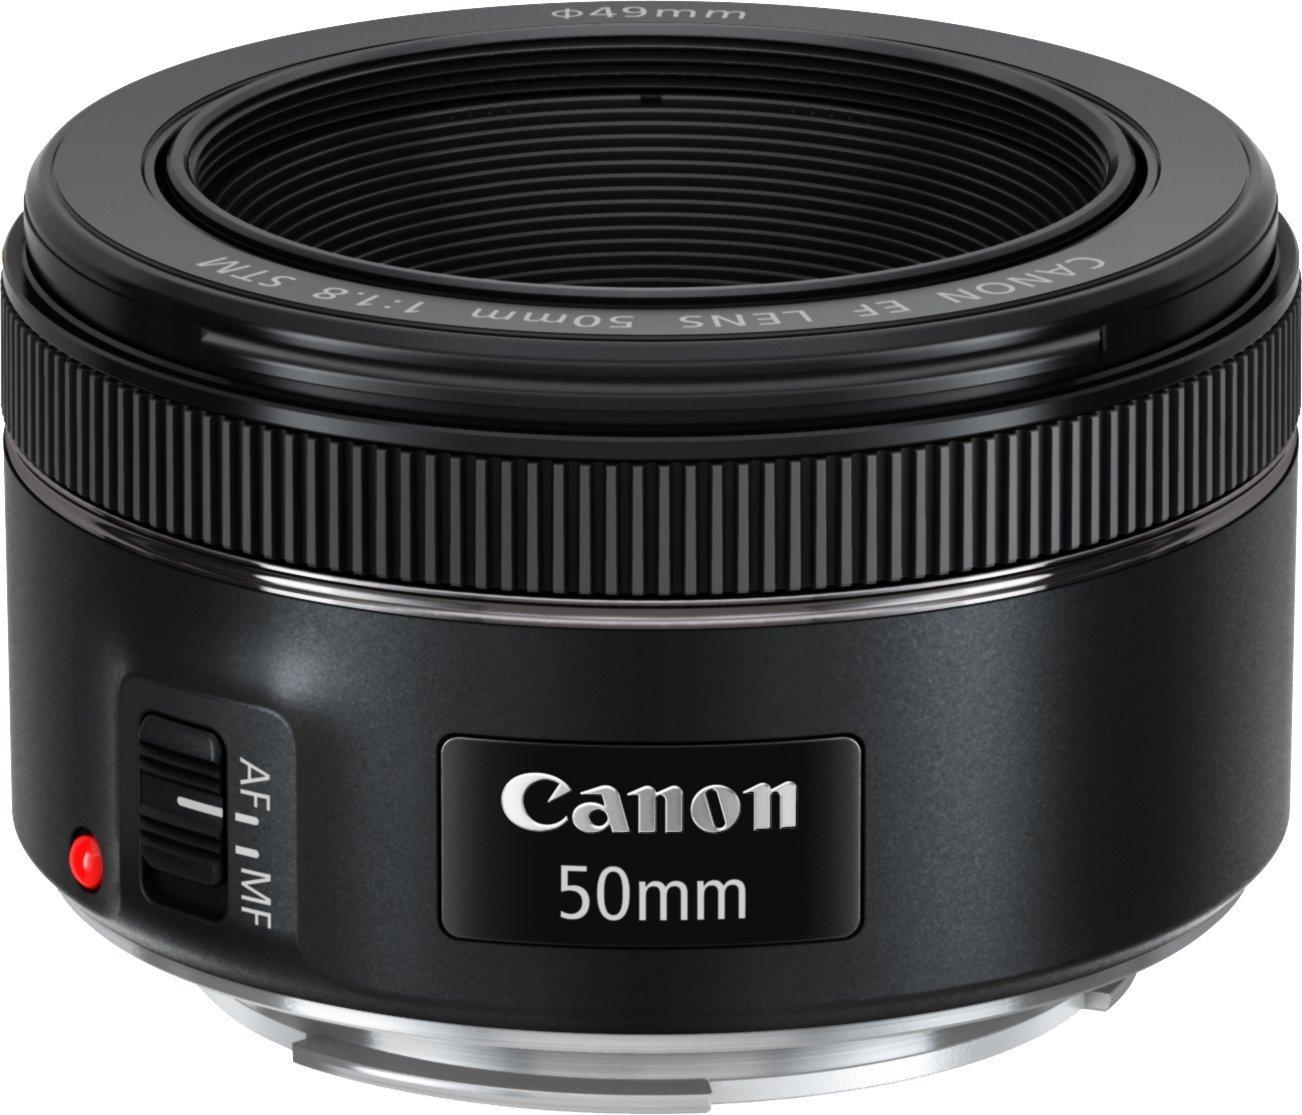 Canon 50mm 1.8 - Muy económico